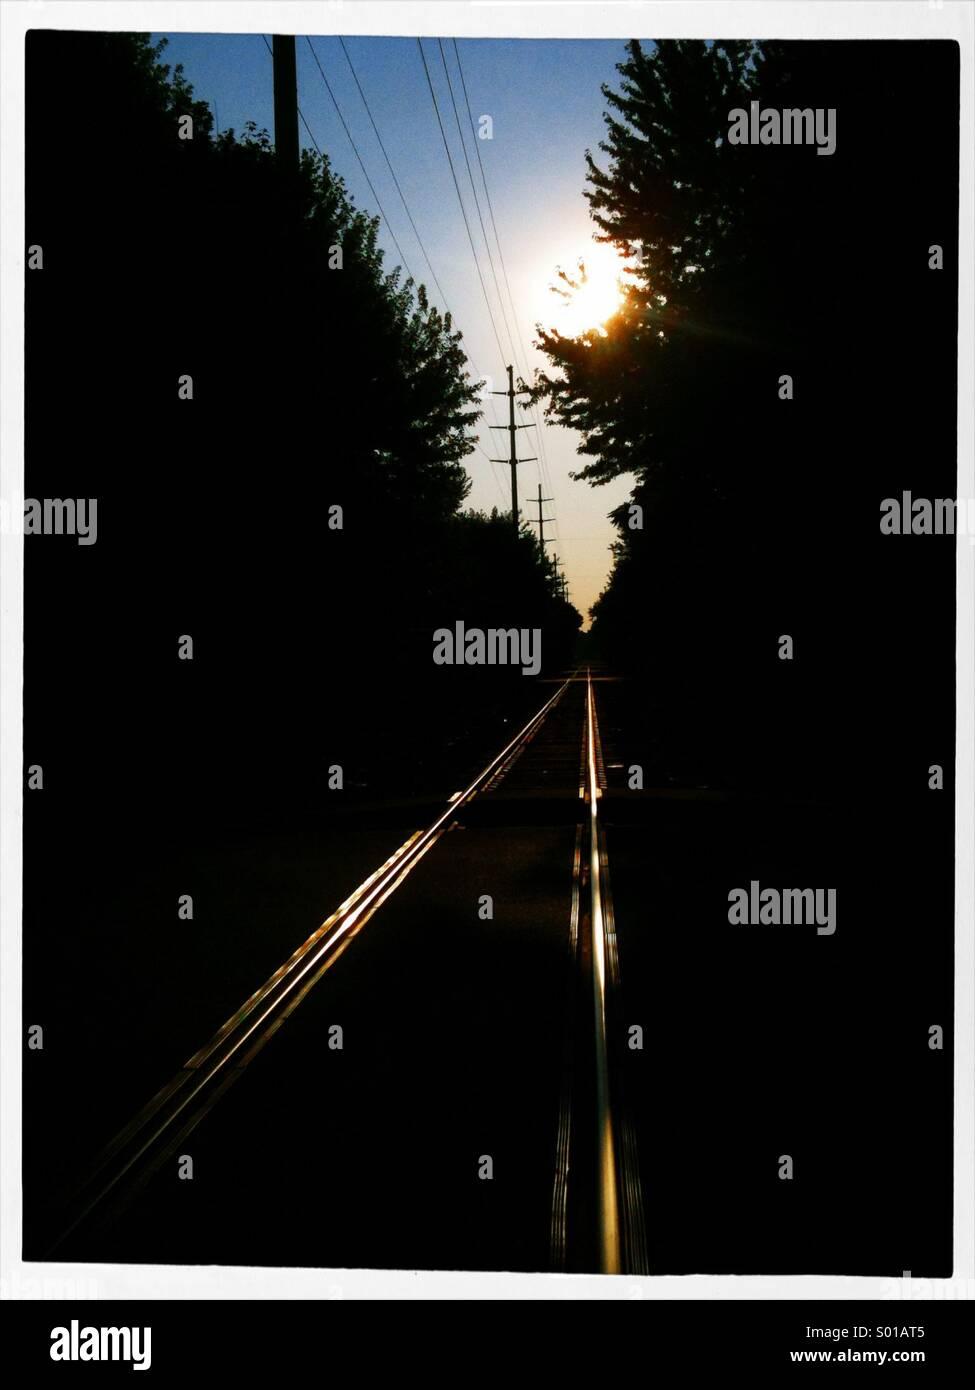 Railroad tracks. - Stock Image